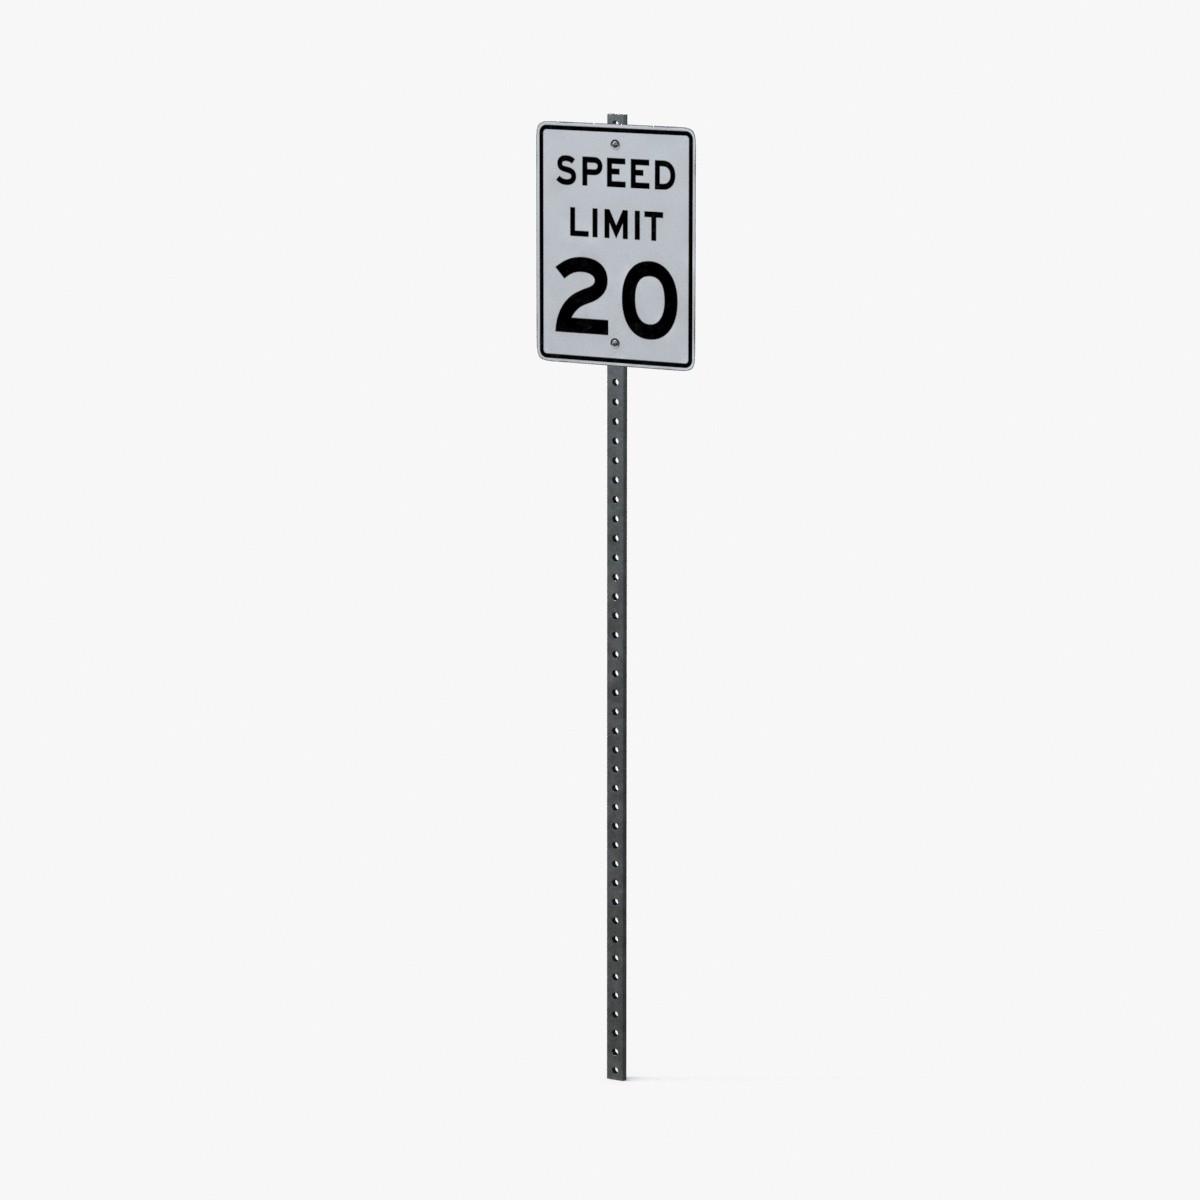 speed limit sign 20 3d model